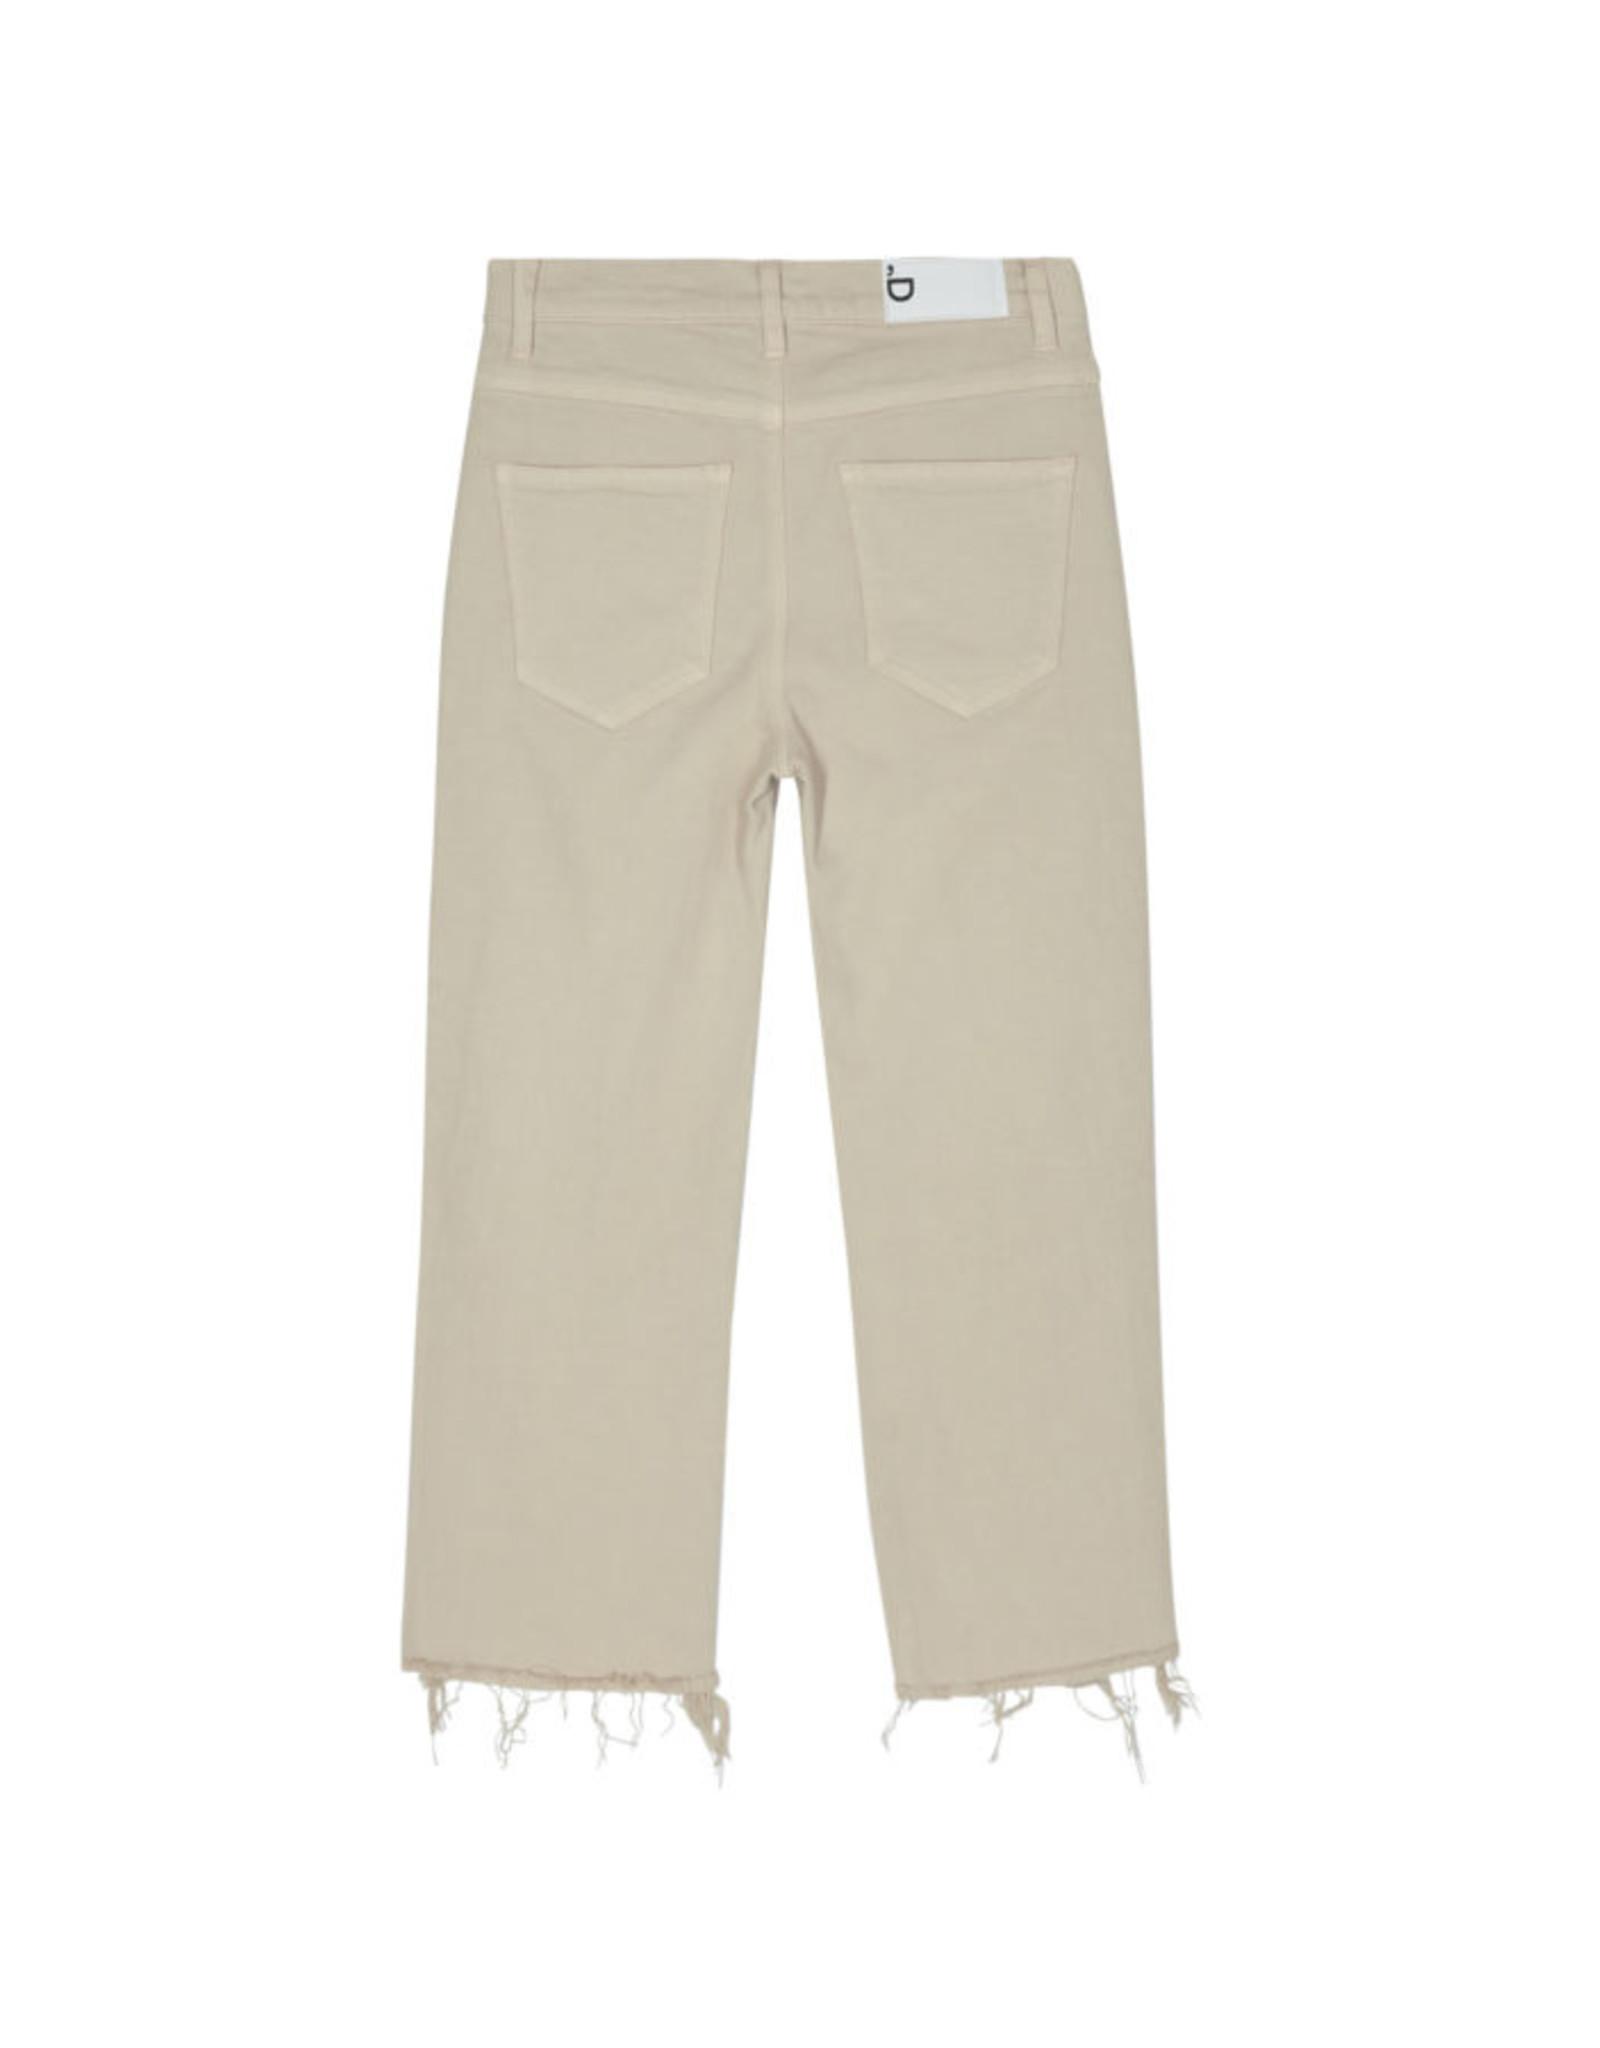 DRG SS21 15967 Bellis jeans